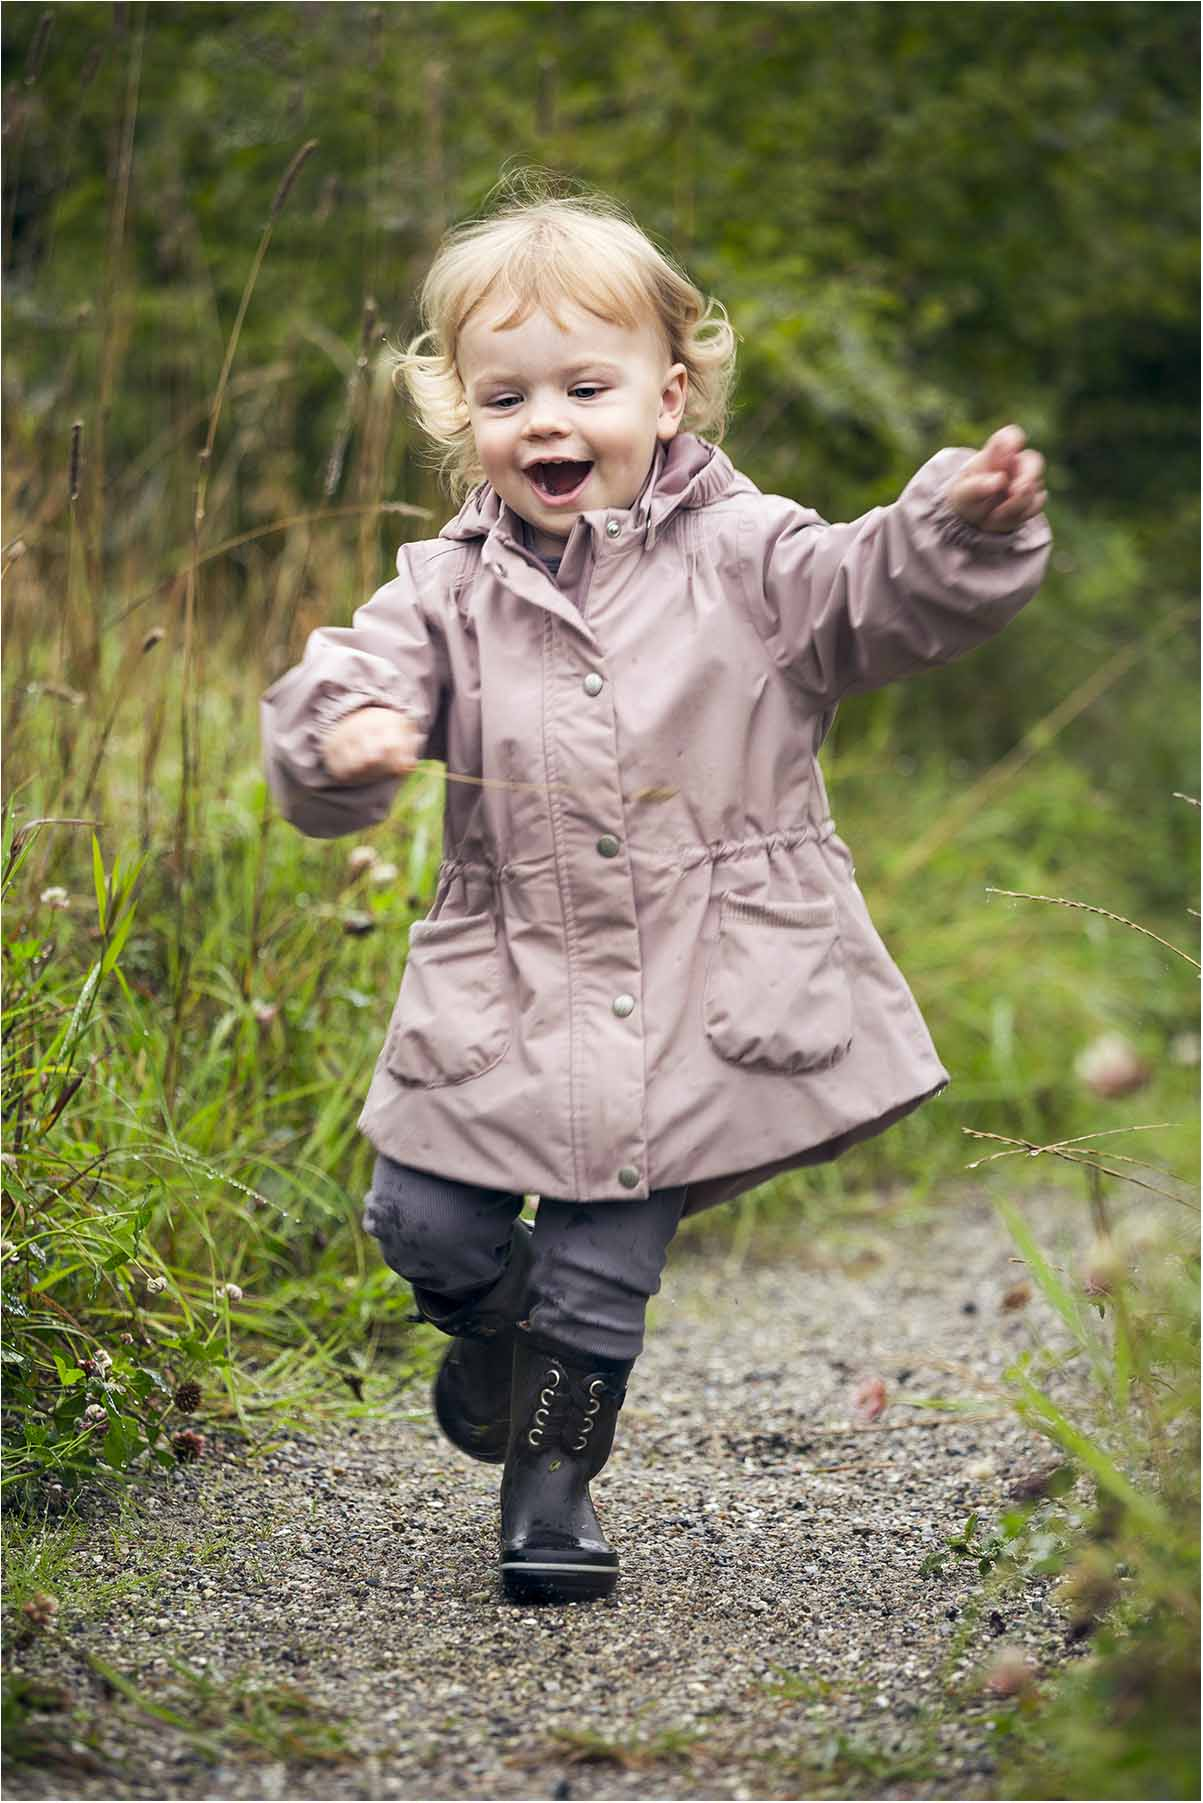 børnefotografering SKANDERBORG